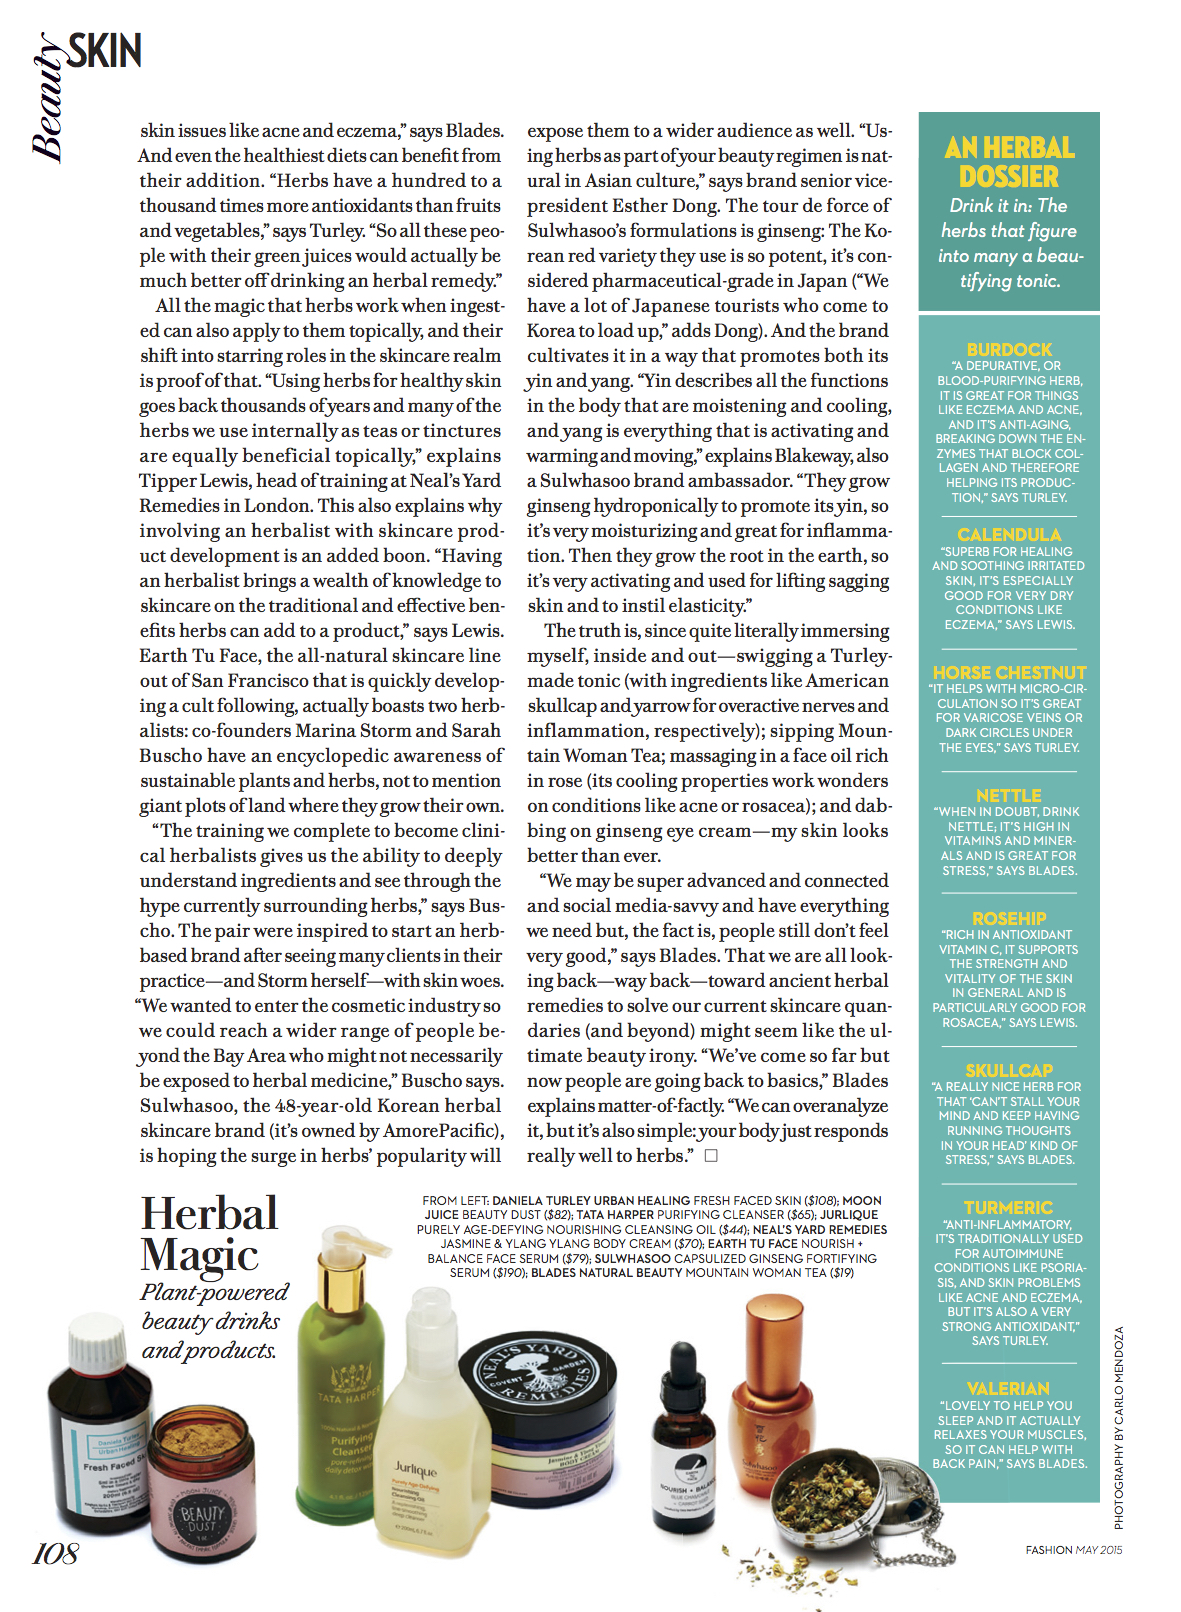 Fashion- Garden Variety April 2015 pg 2.jpg